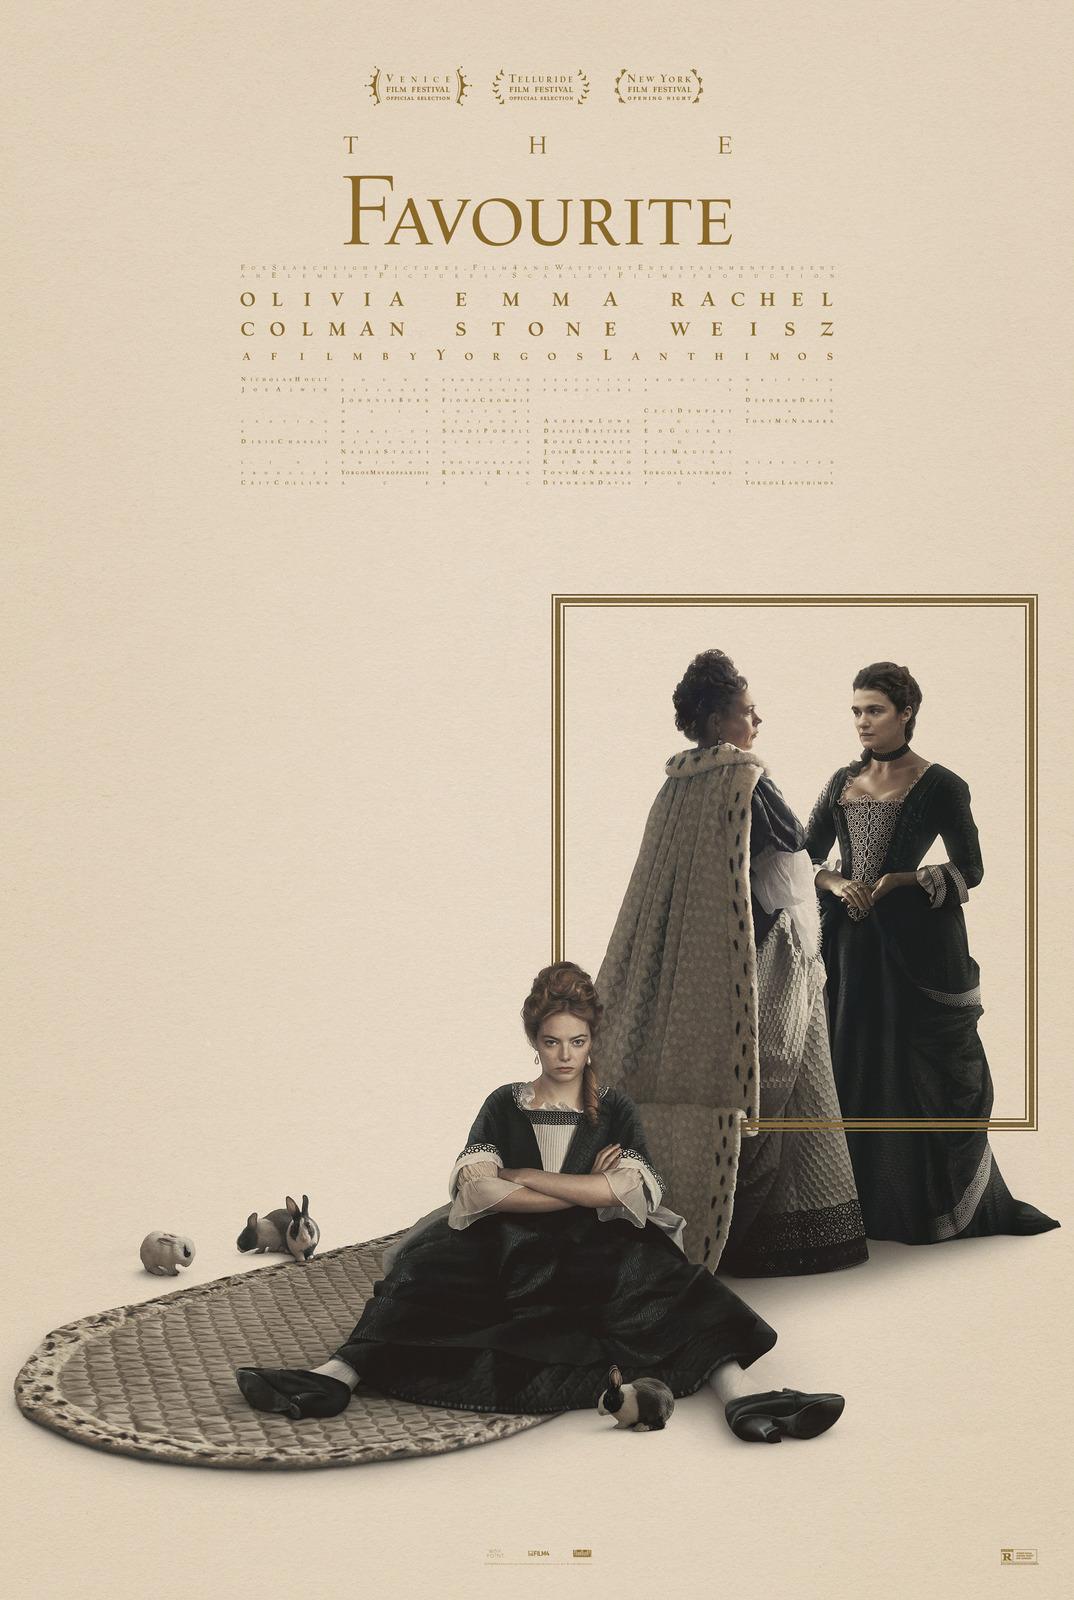 Emma Stone stars in THE FAVOURITE